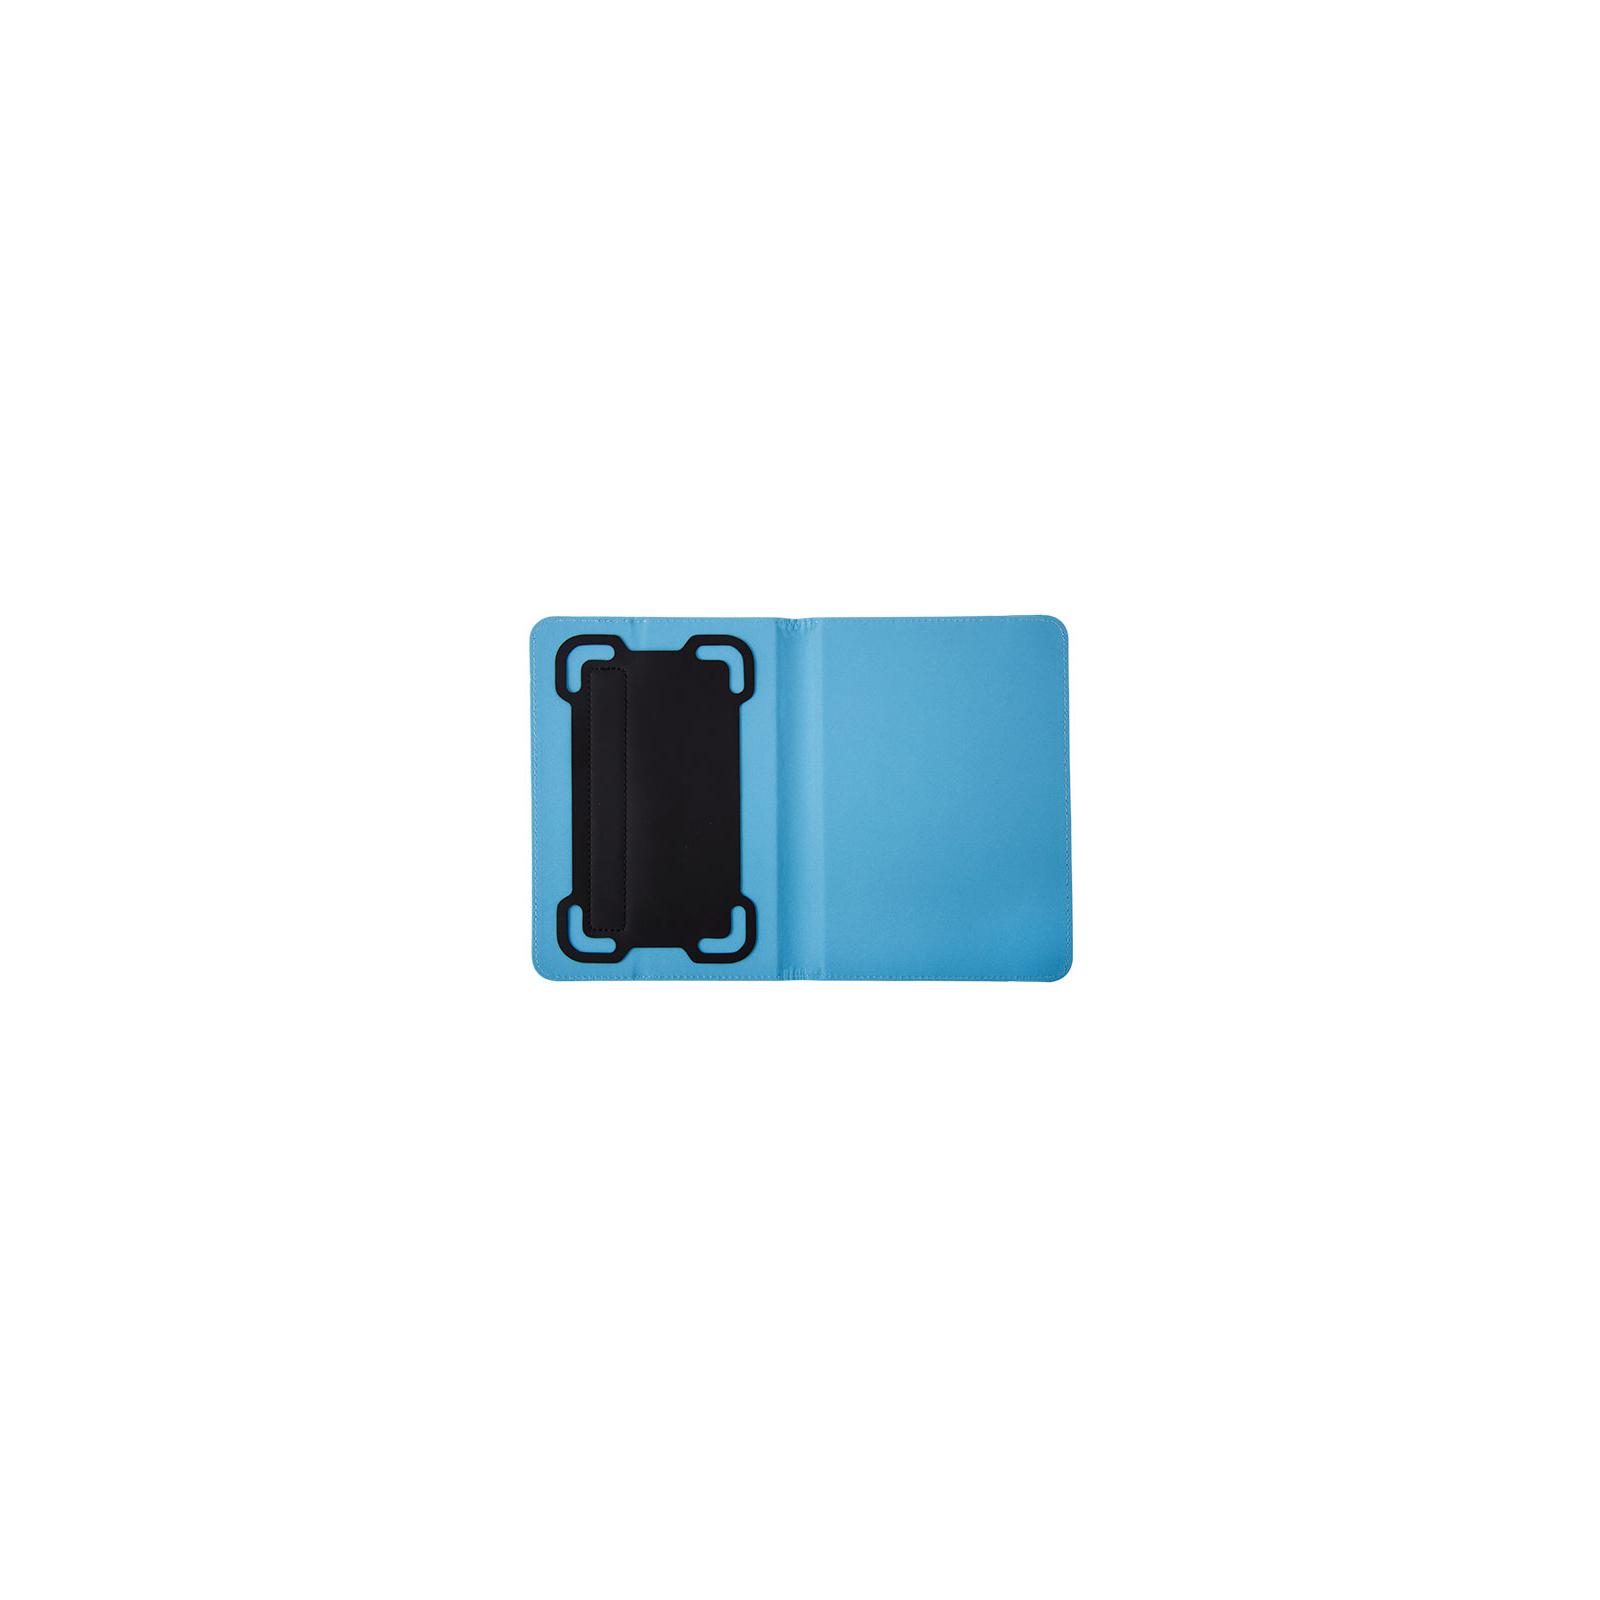 "Чехол для планшета Vellini 7"" Universal stand Dark Blue (216877) изображение 2"